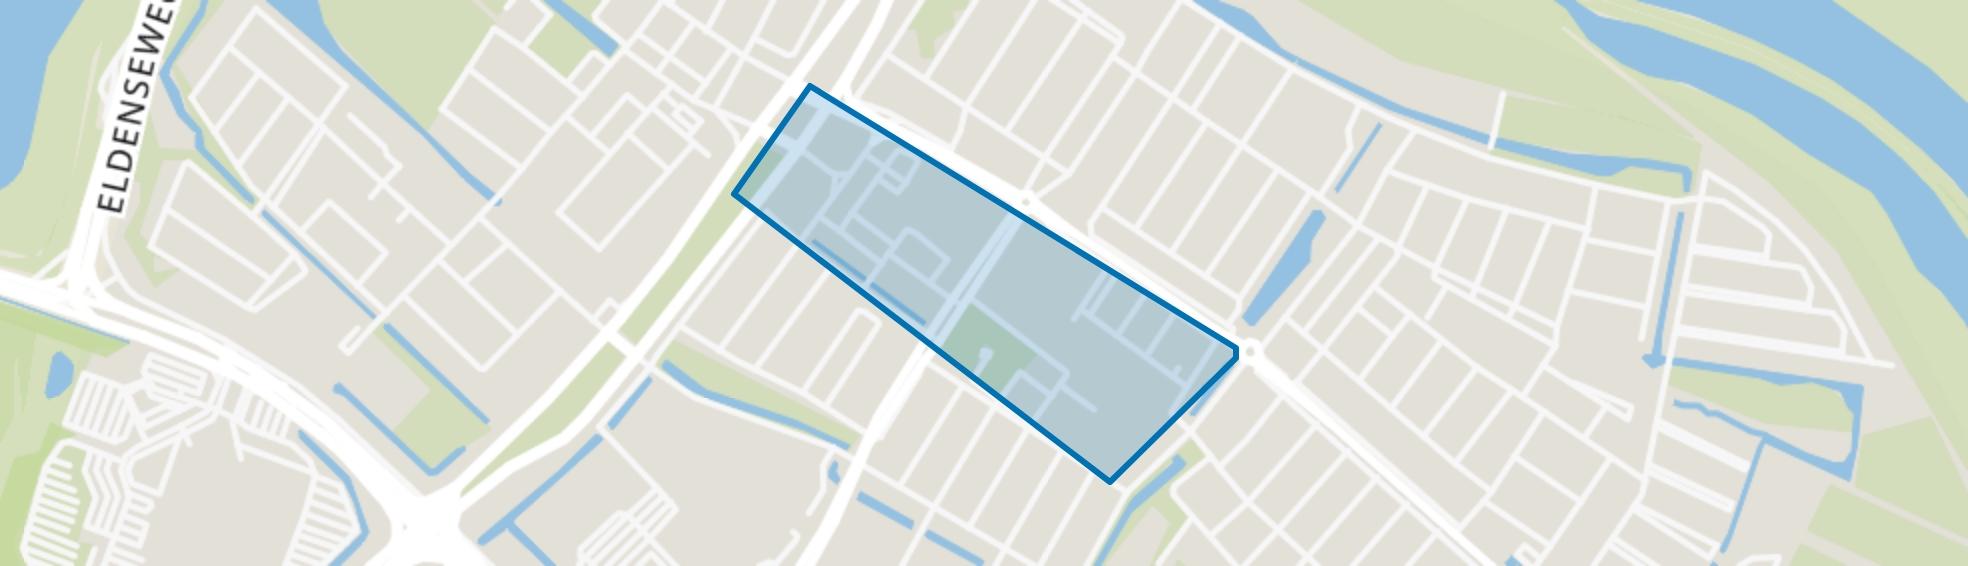 Middelgraaflaan e.o., Arnhem map